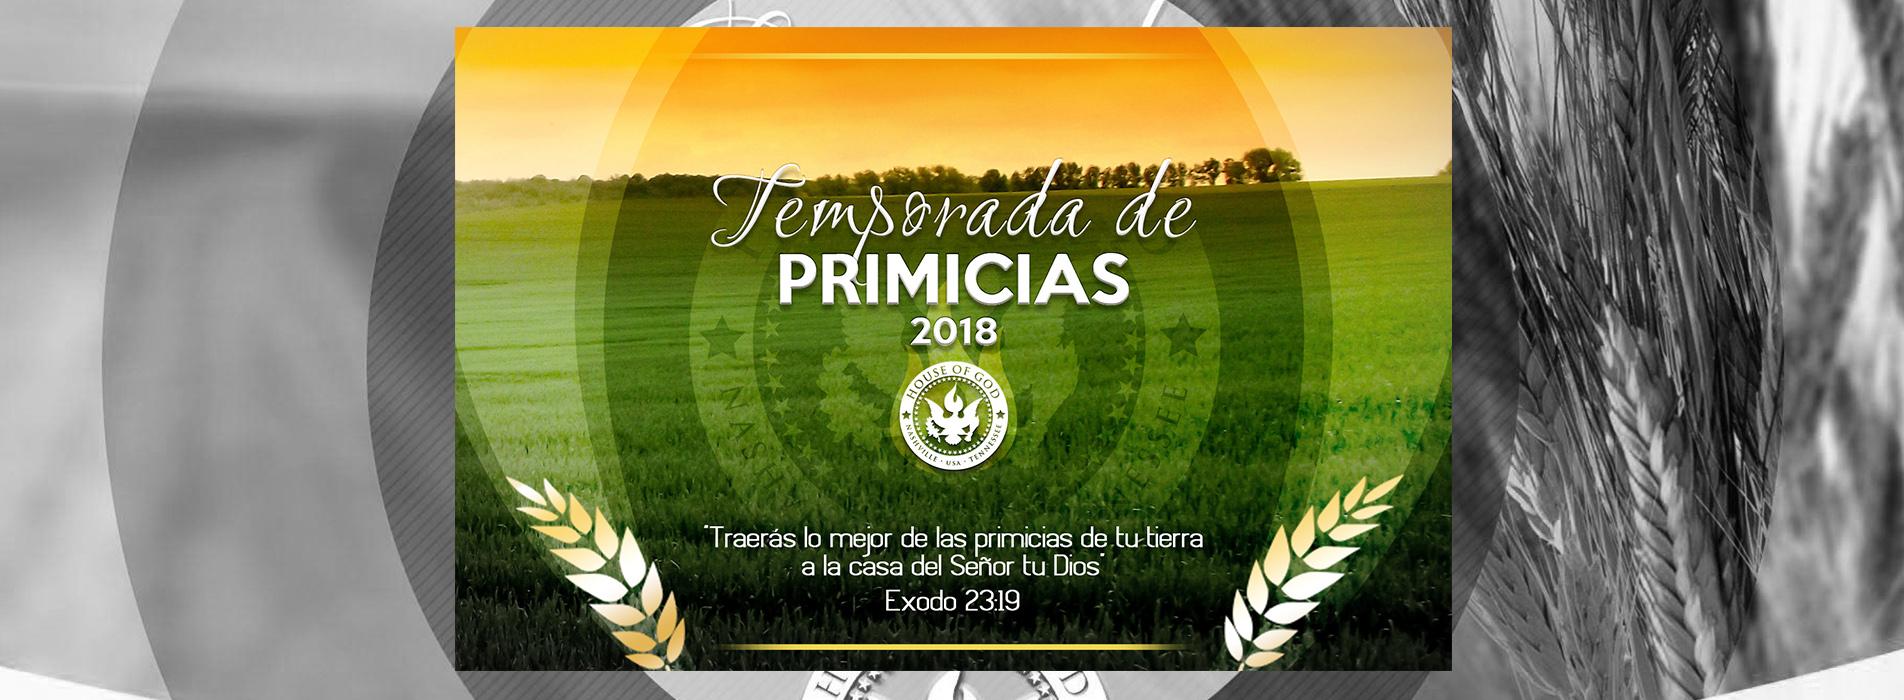 Main-Slider-Primicias-2018B